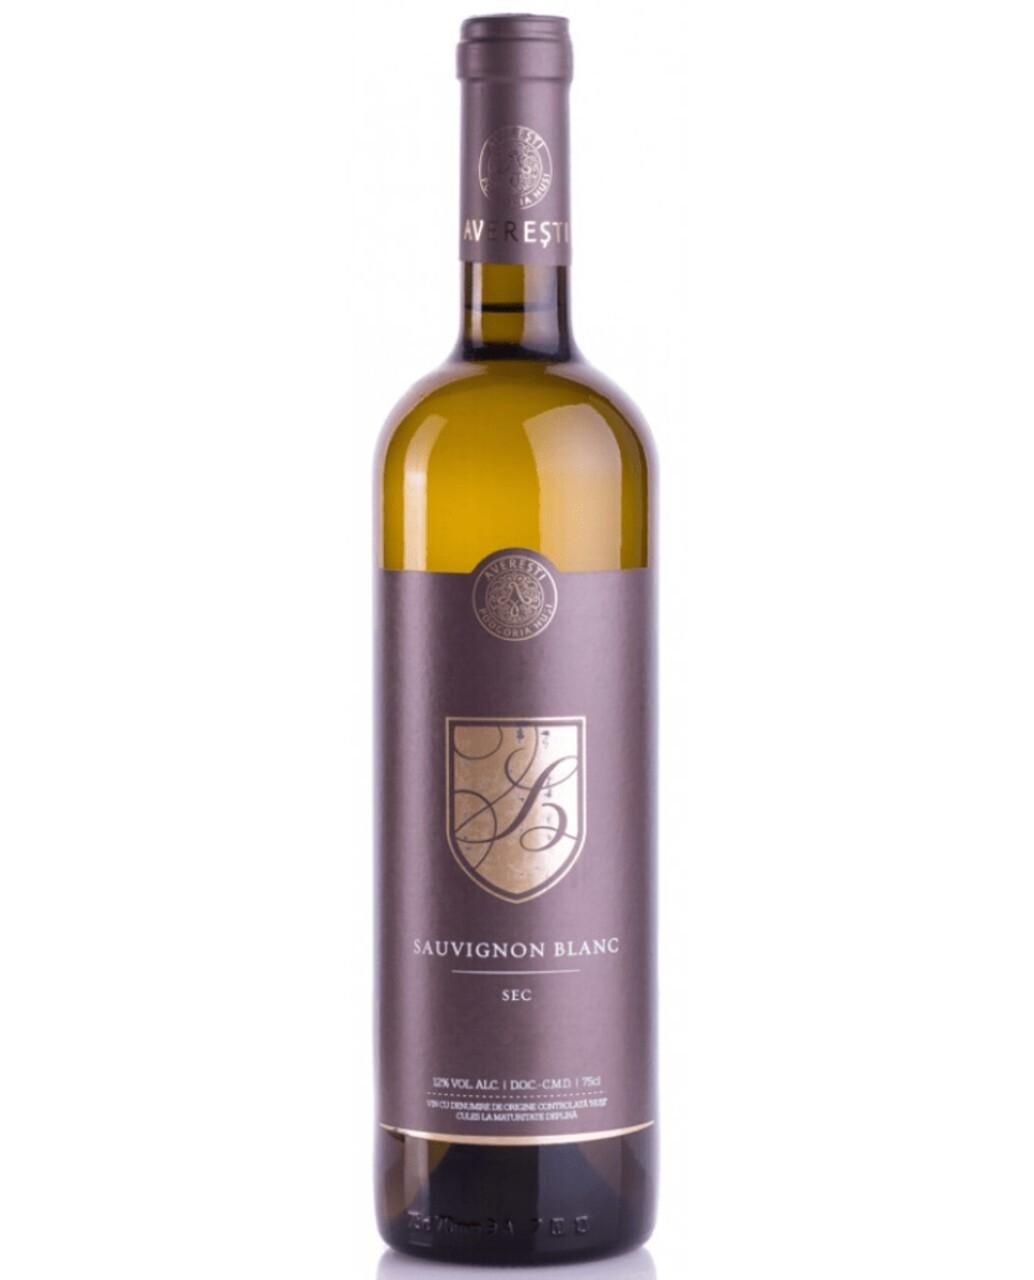 Averesti Regala Sauvignon Blanc